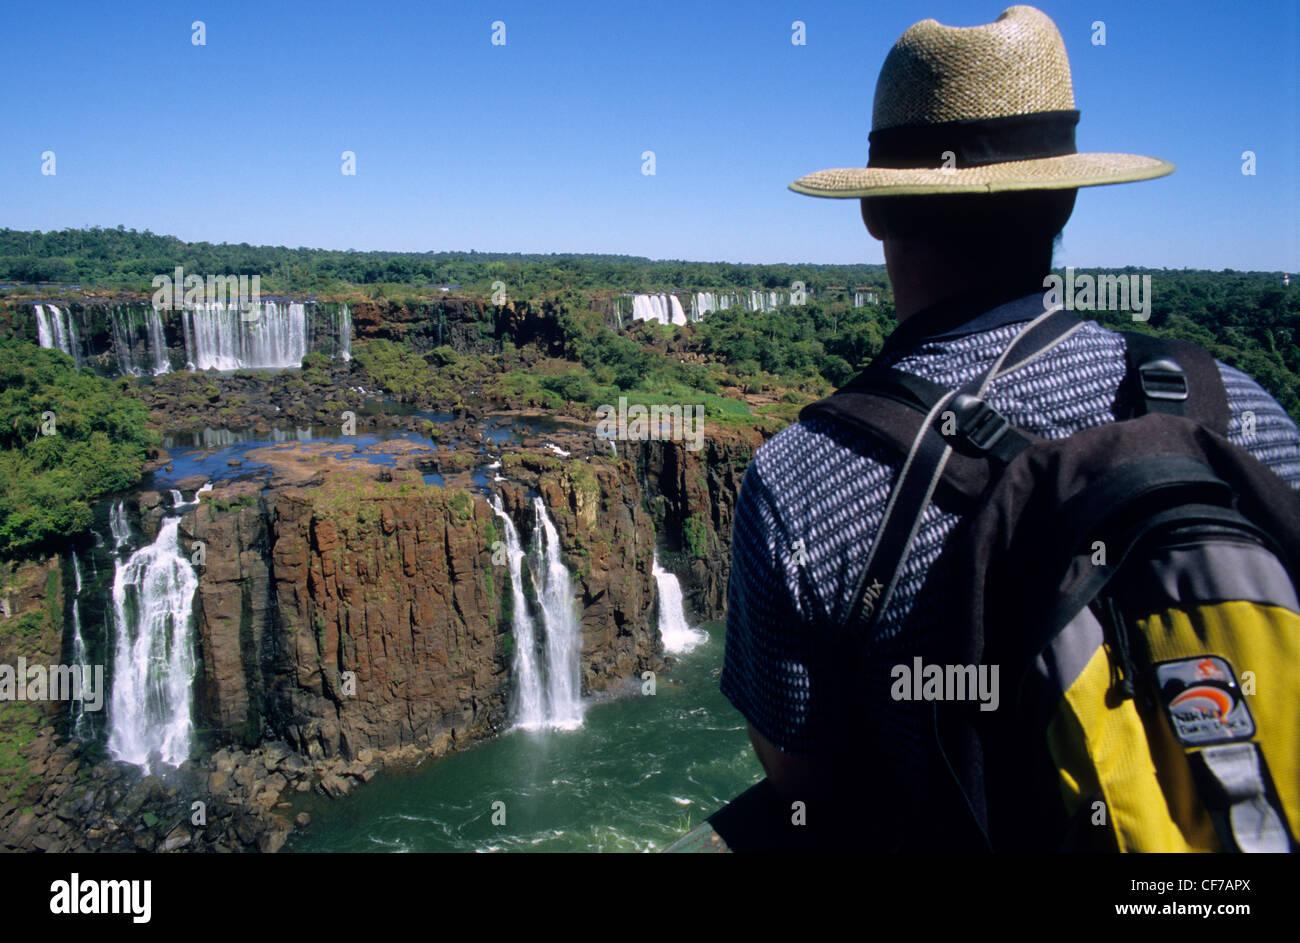 Iguazu falls ,  Misiones province. Argentina. South America. - Stock Image